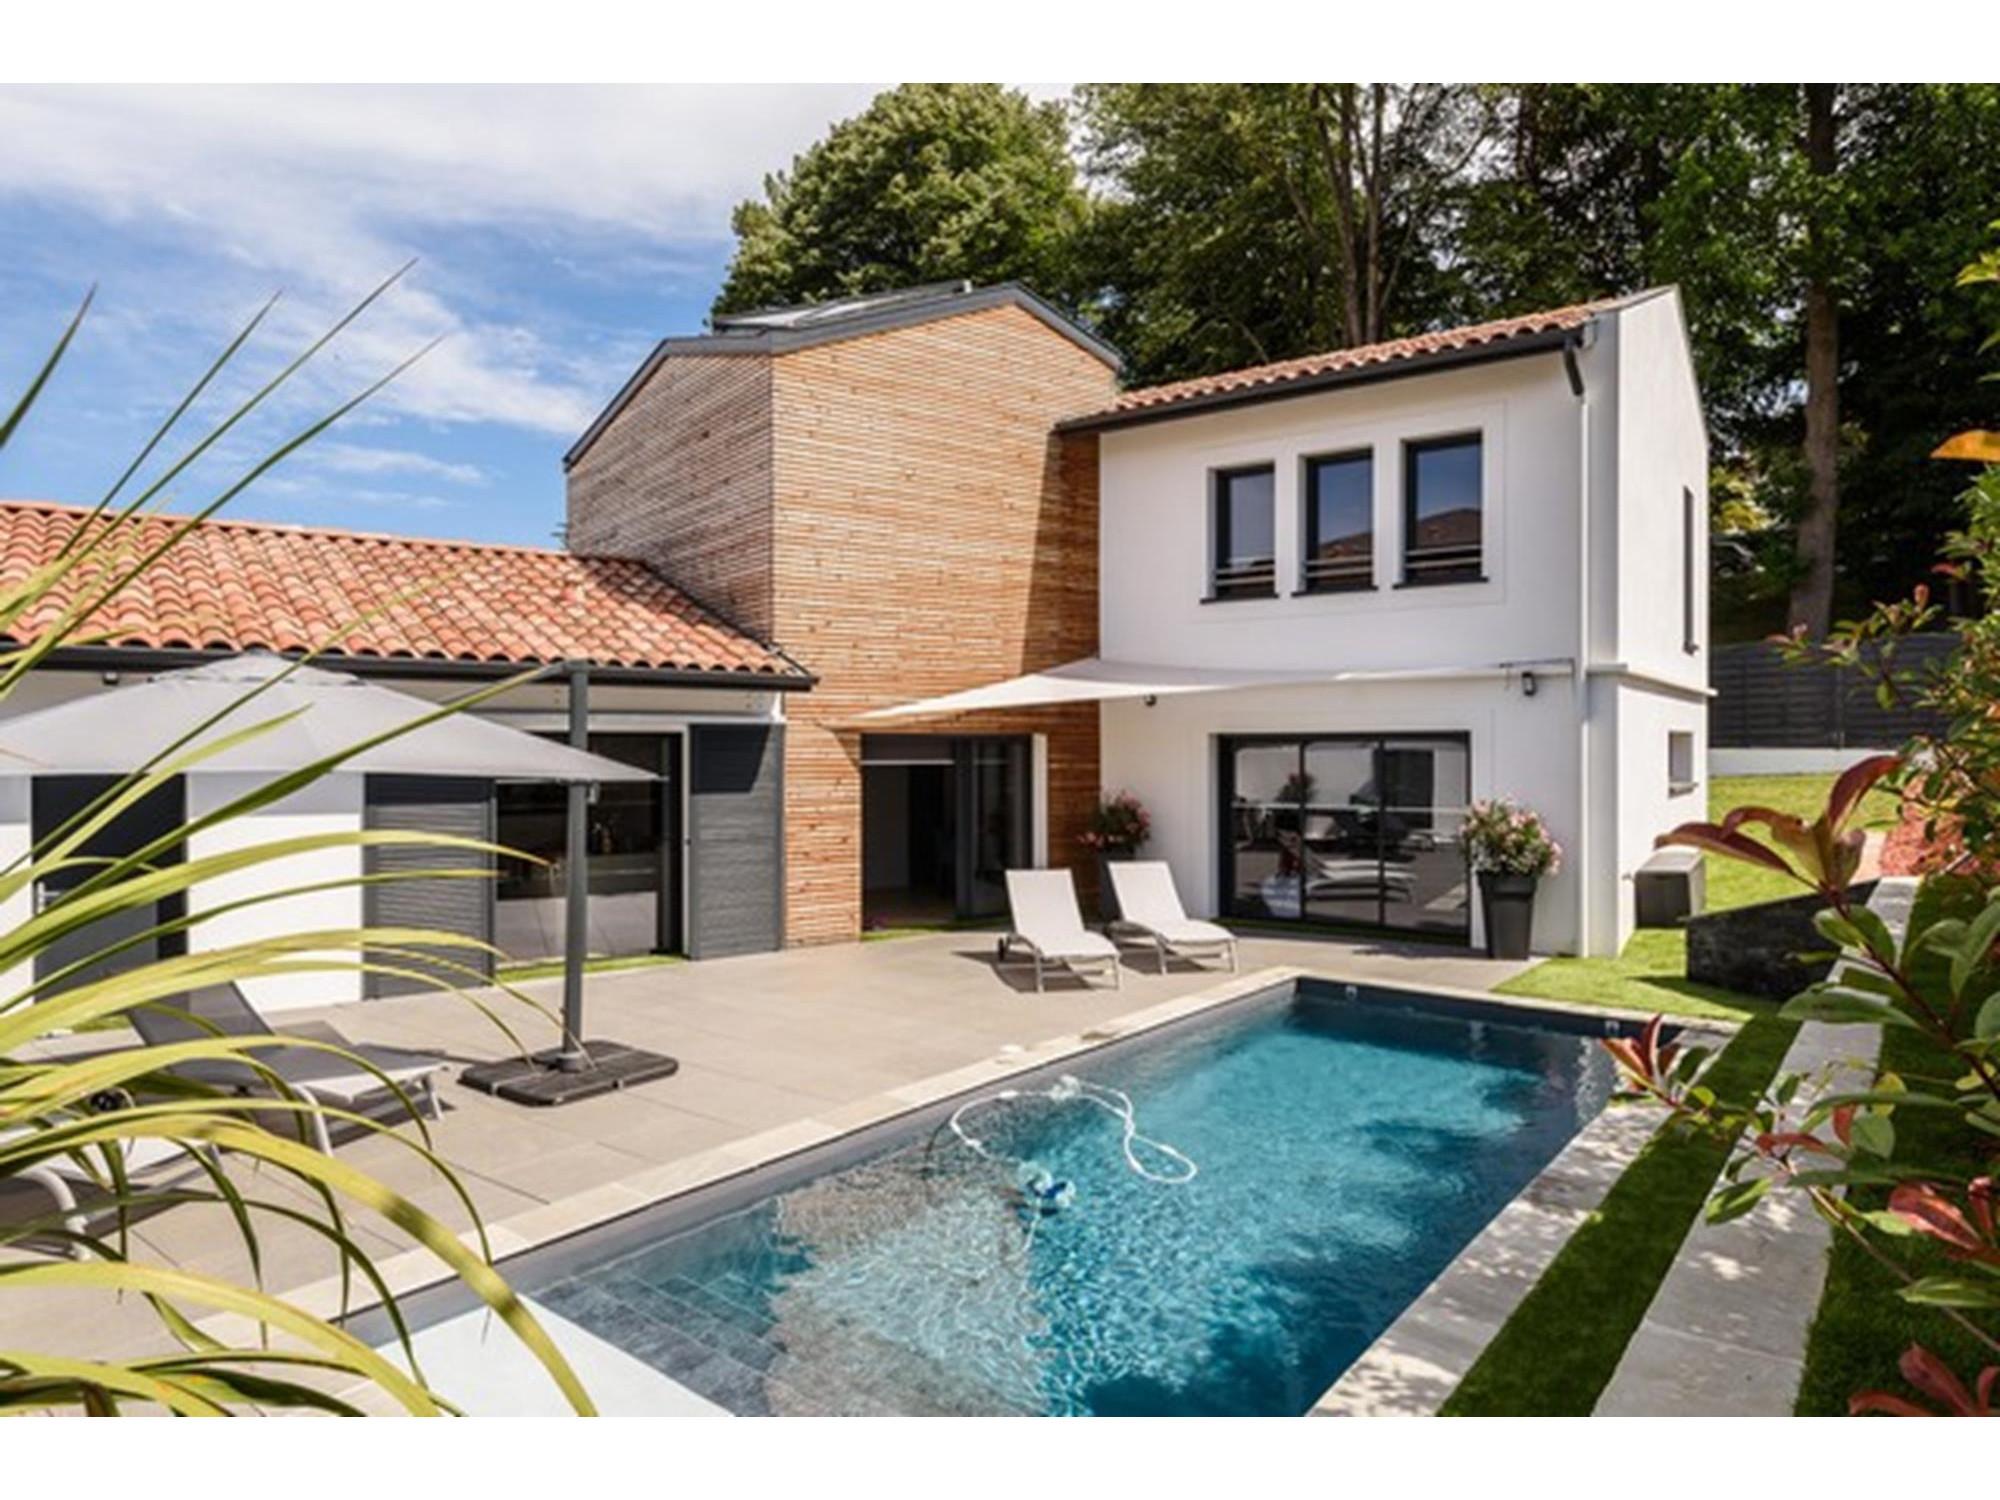 Belle villa contemporaine avec piscine